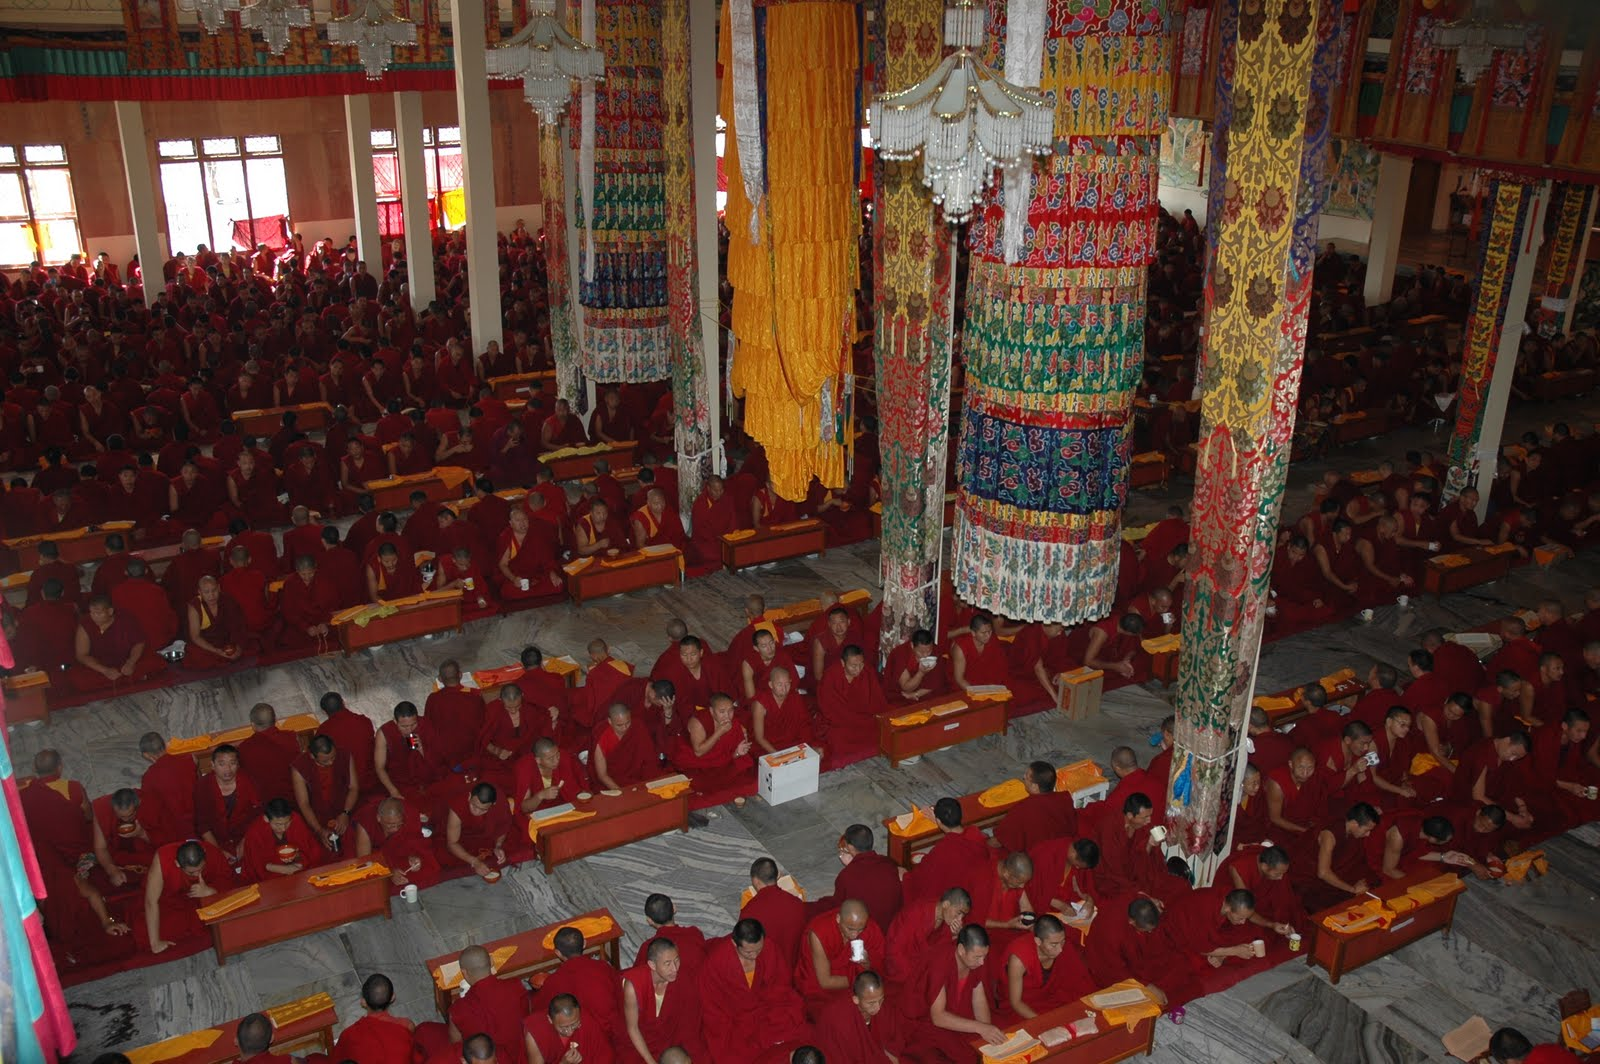 Monks of Sera Je Monastery doing puja and prayers